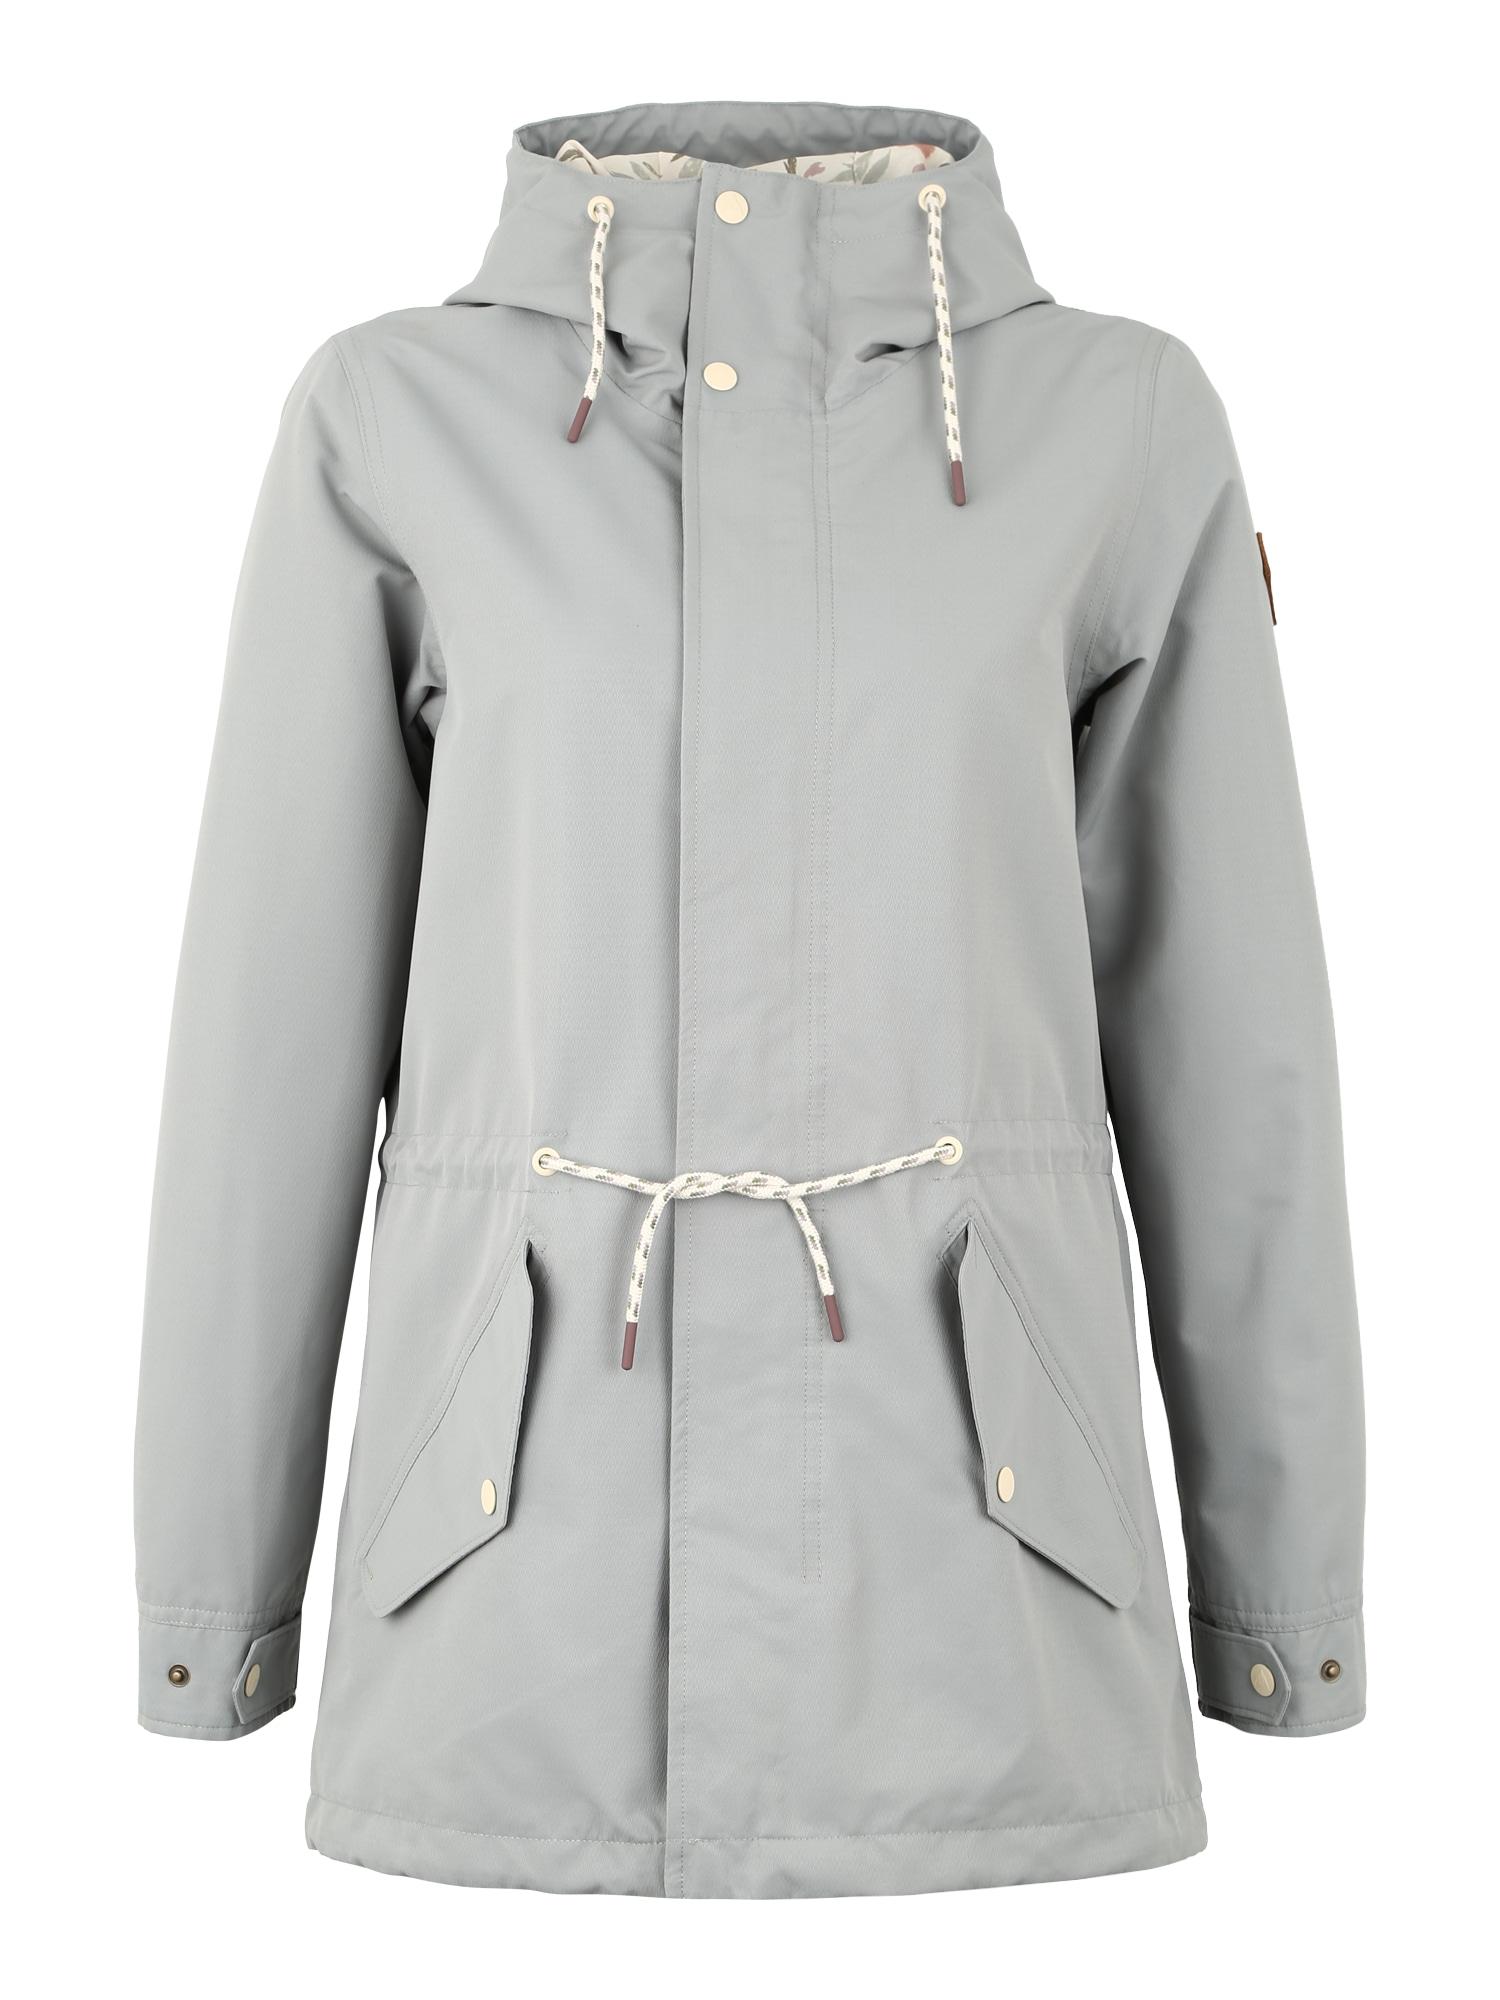 Outdoorový kabát Sadie světle šedá BURTON